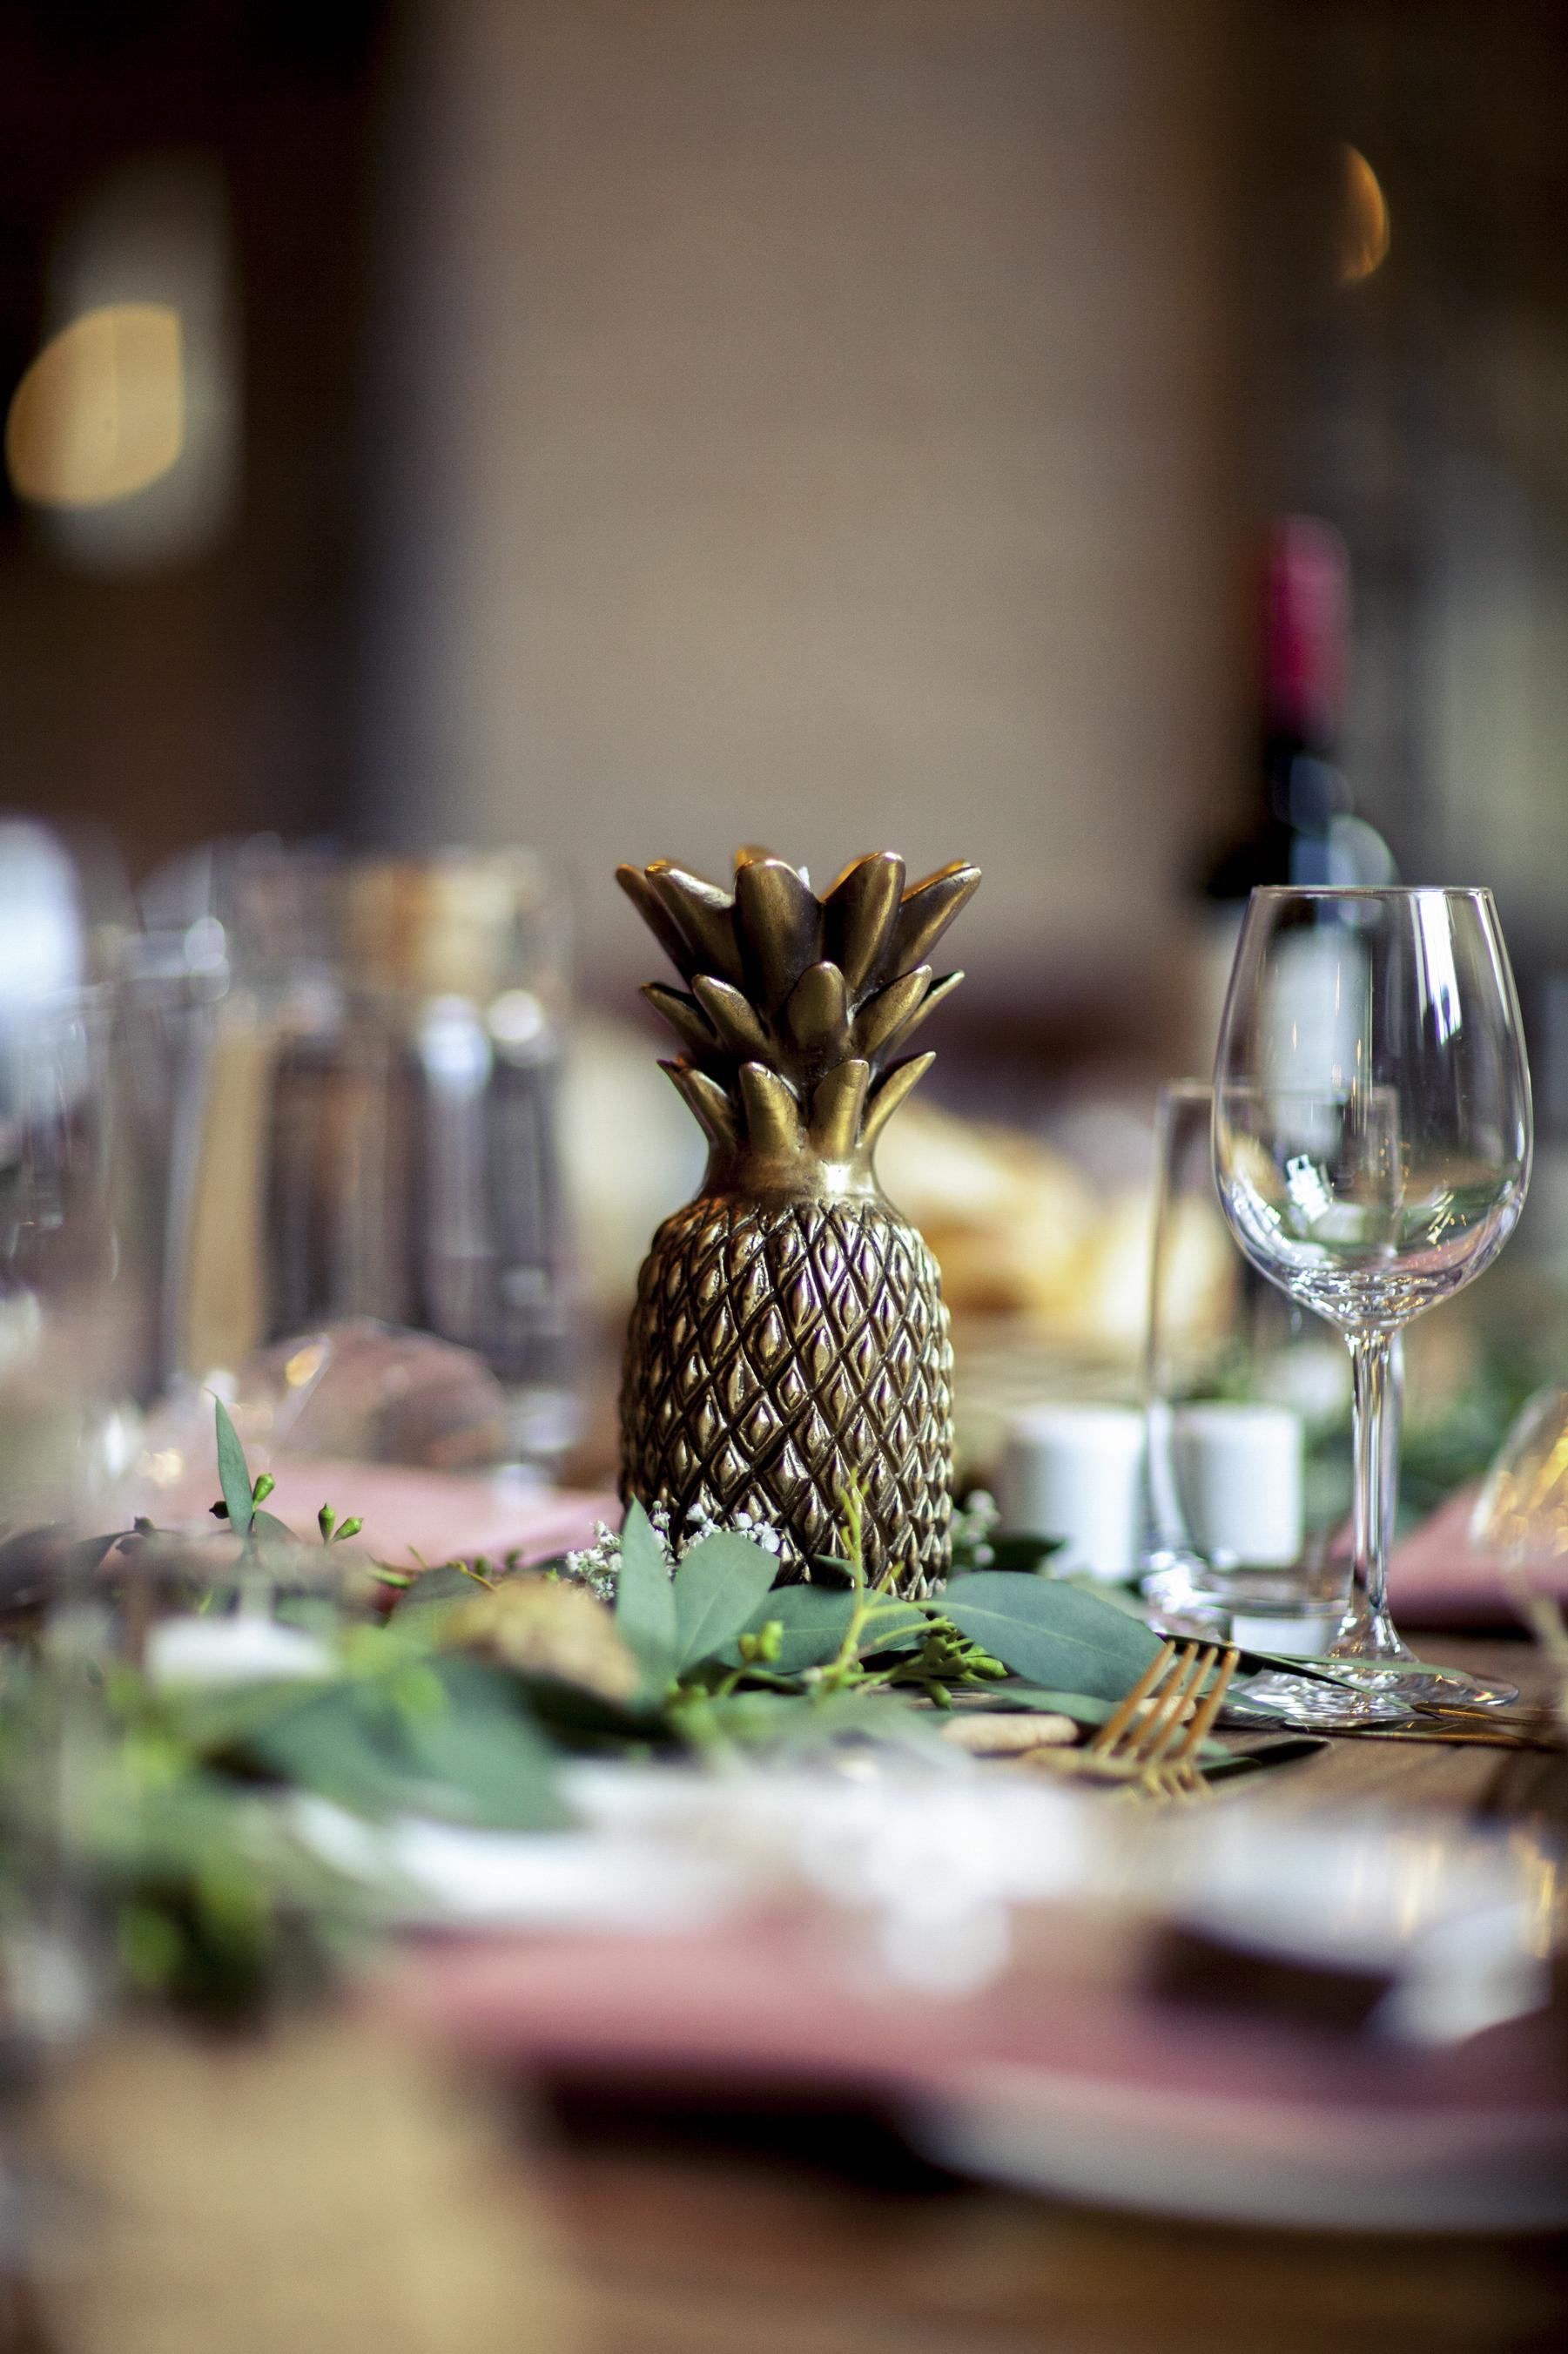 Pineapple, Centre piece, table scape, autumn Wedding,